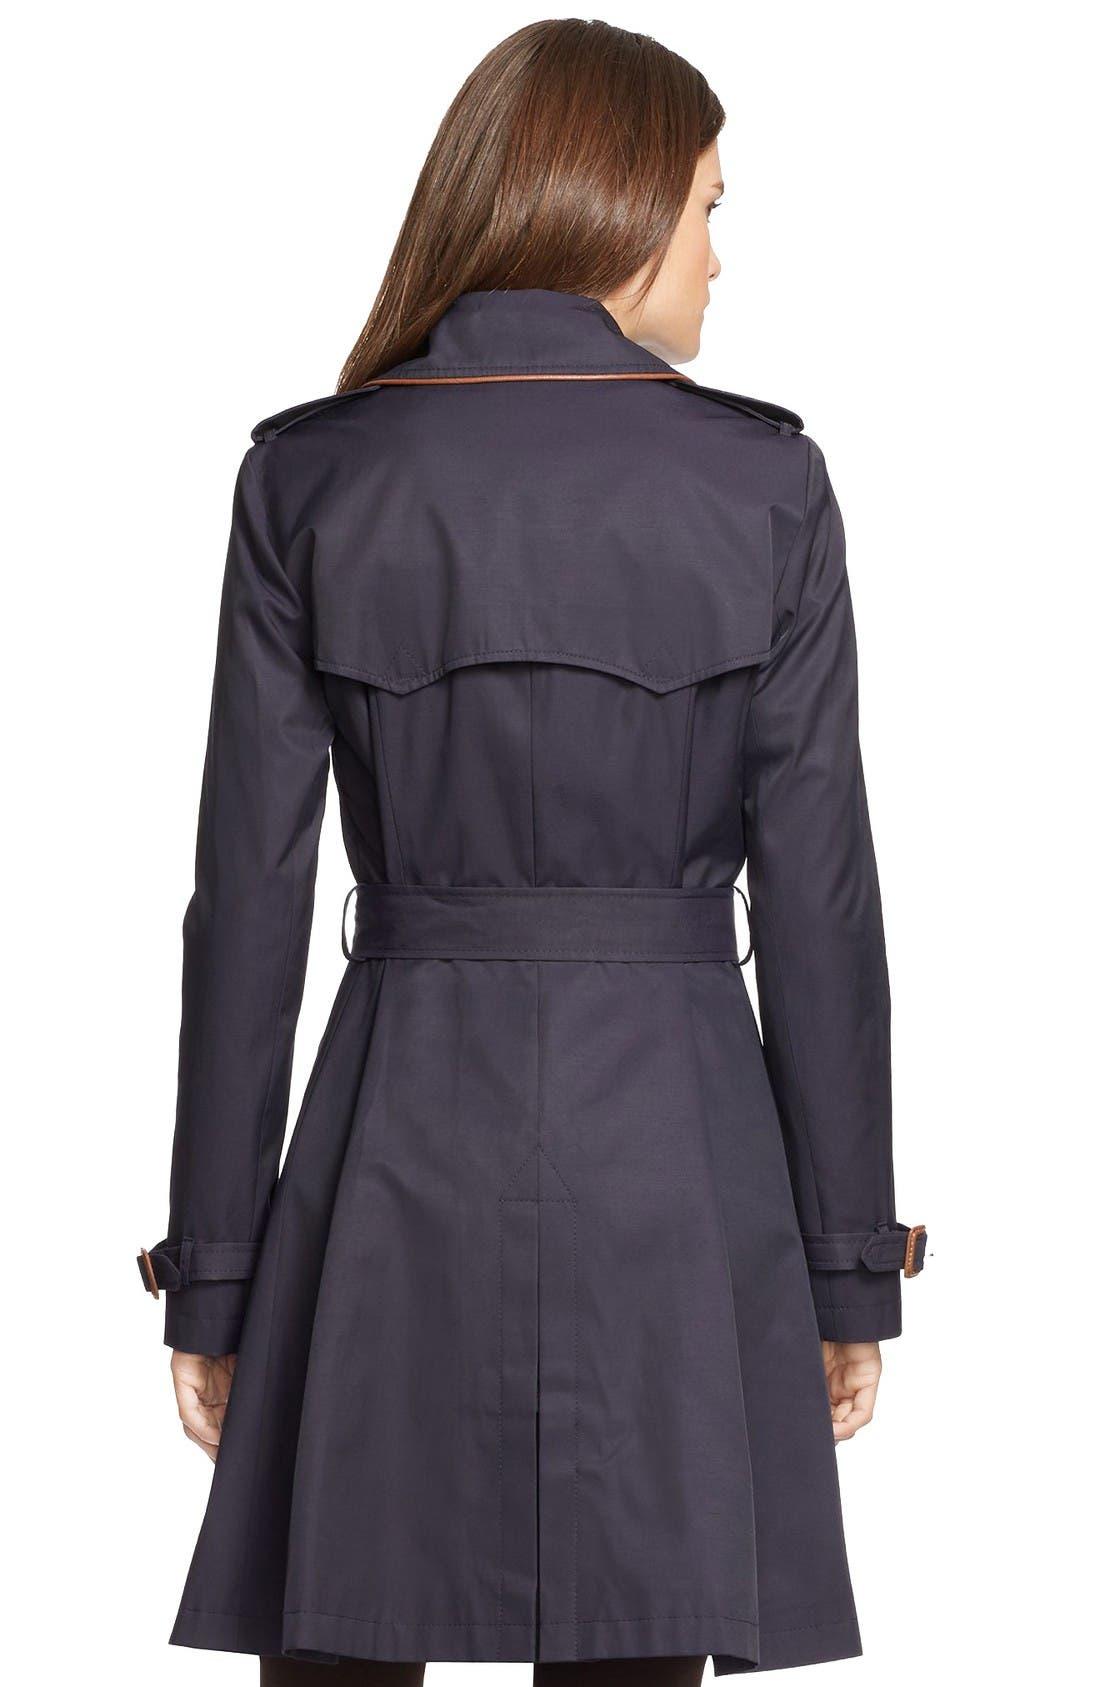 Alternate Image 2  - Lauren Ralph Lauren Faux Leather Trim Trench Coat (Regular & Petite)